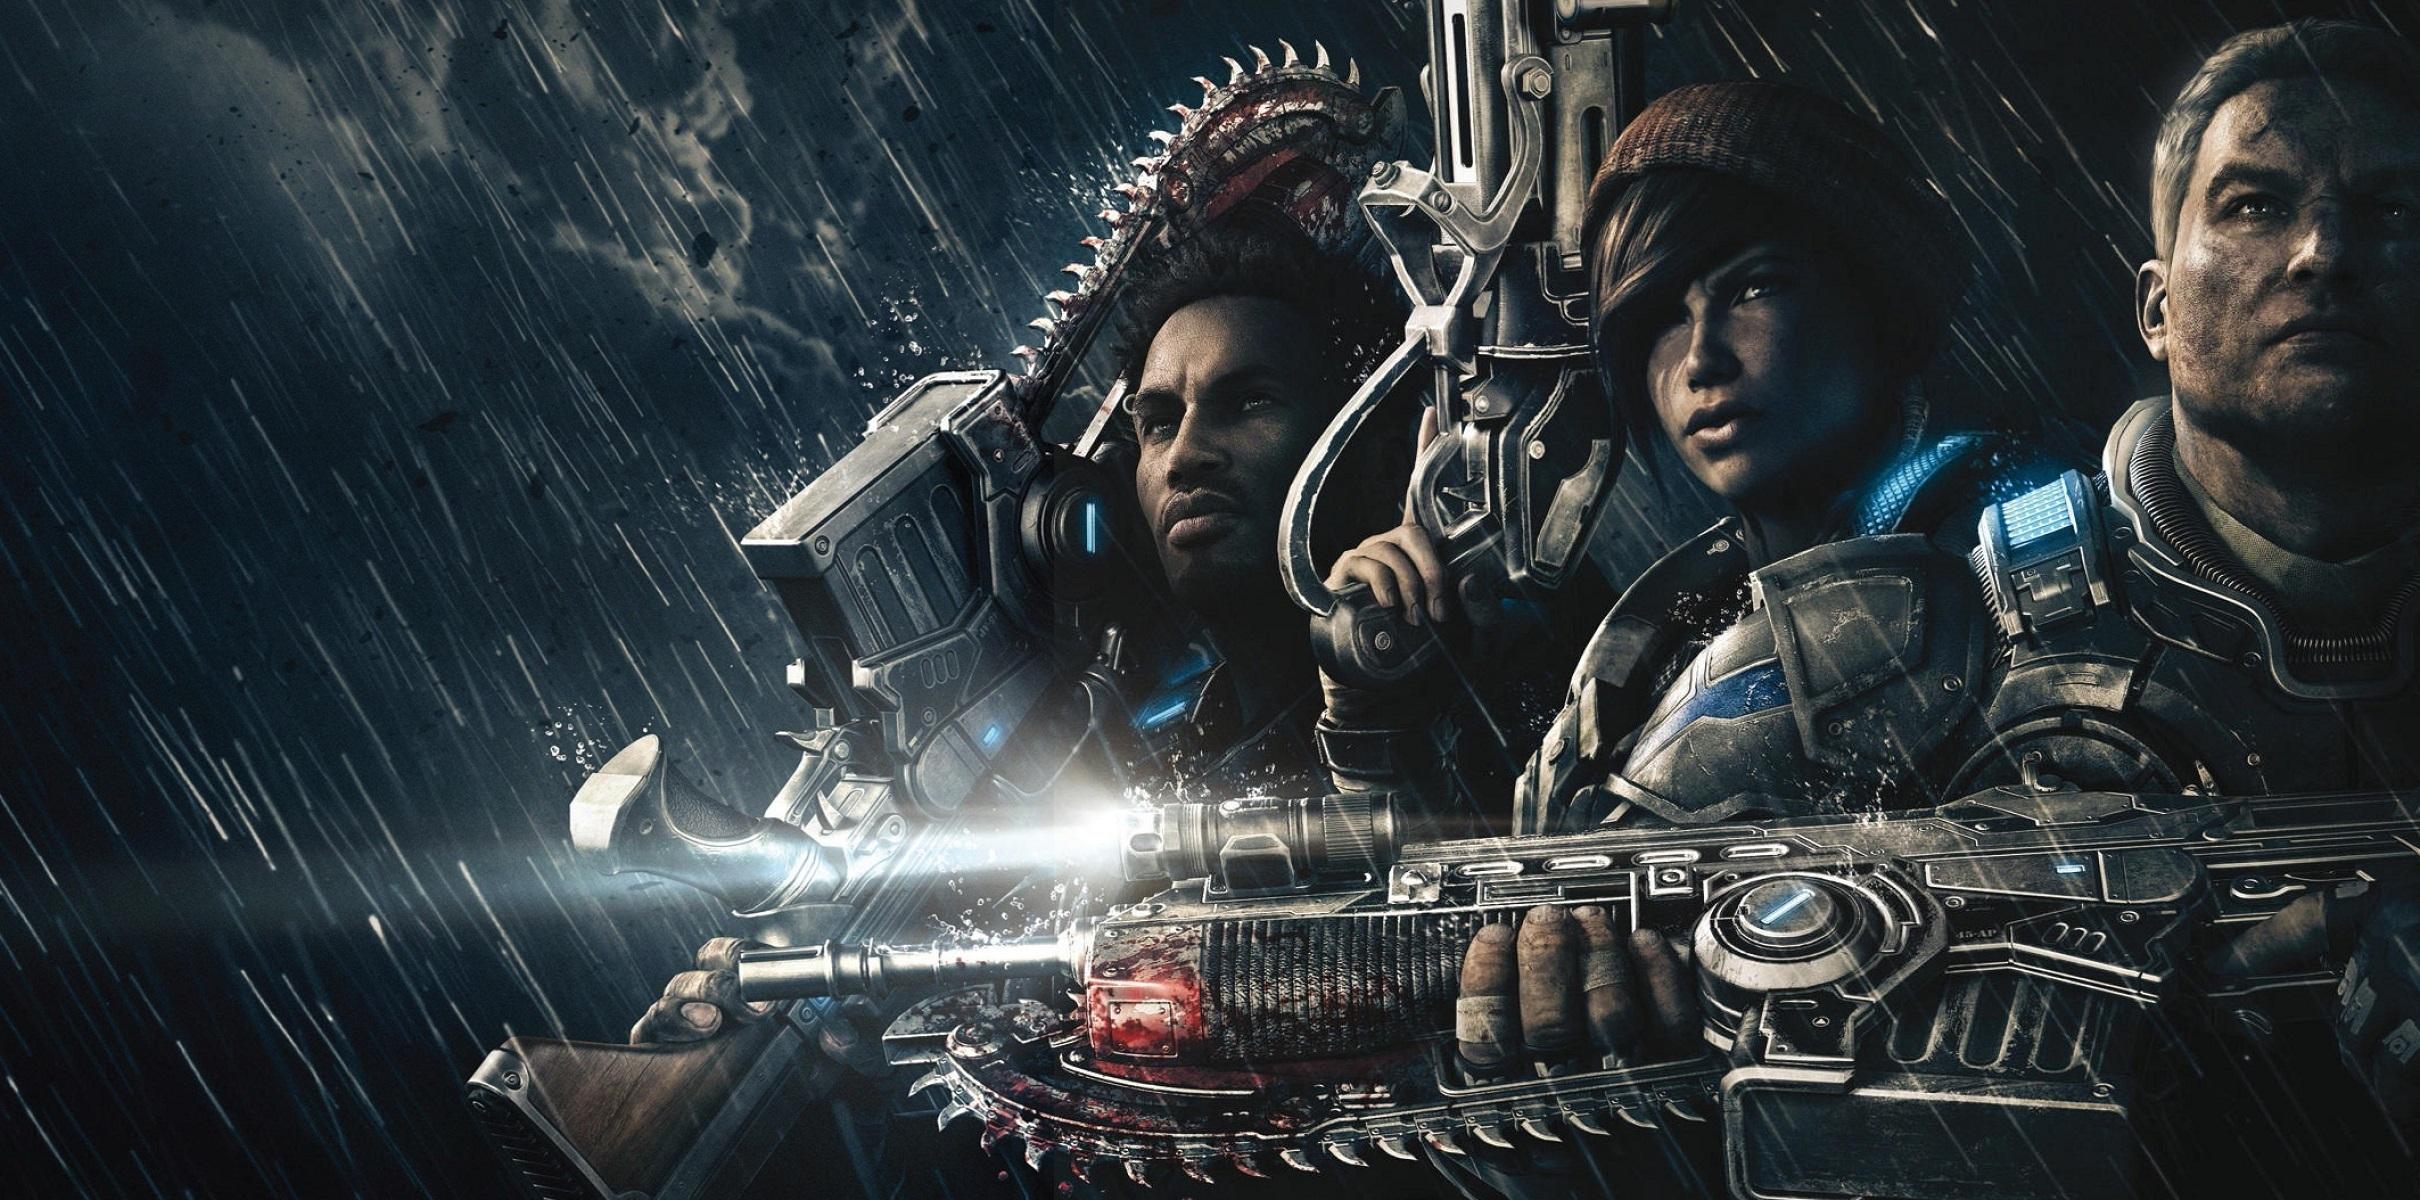 gears of war 4 full hd fond d'écran and arrière-plan | 2420x1200